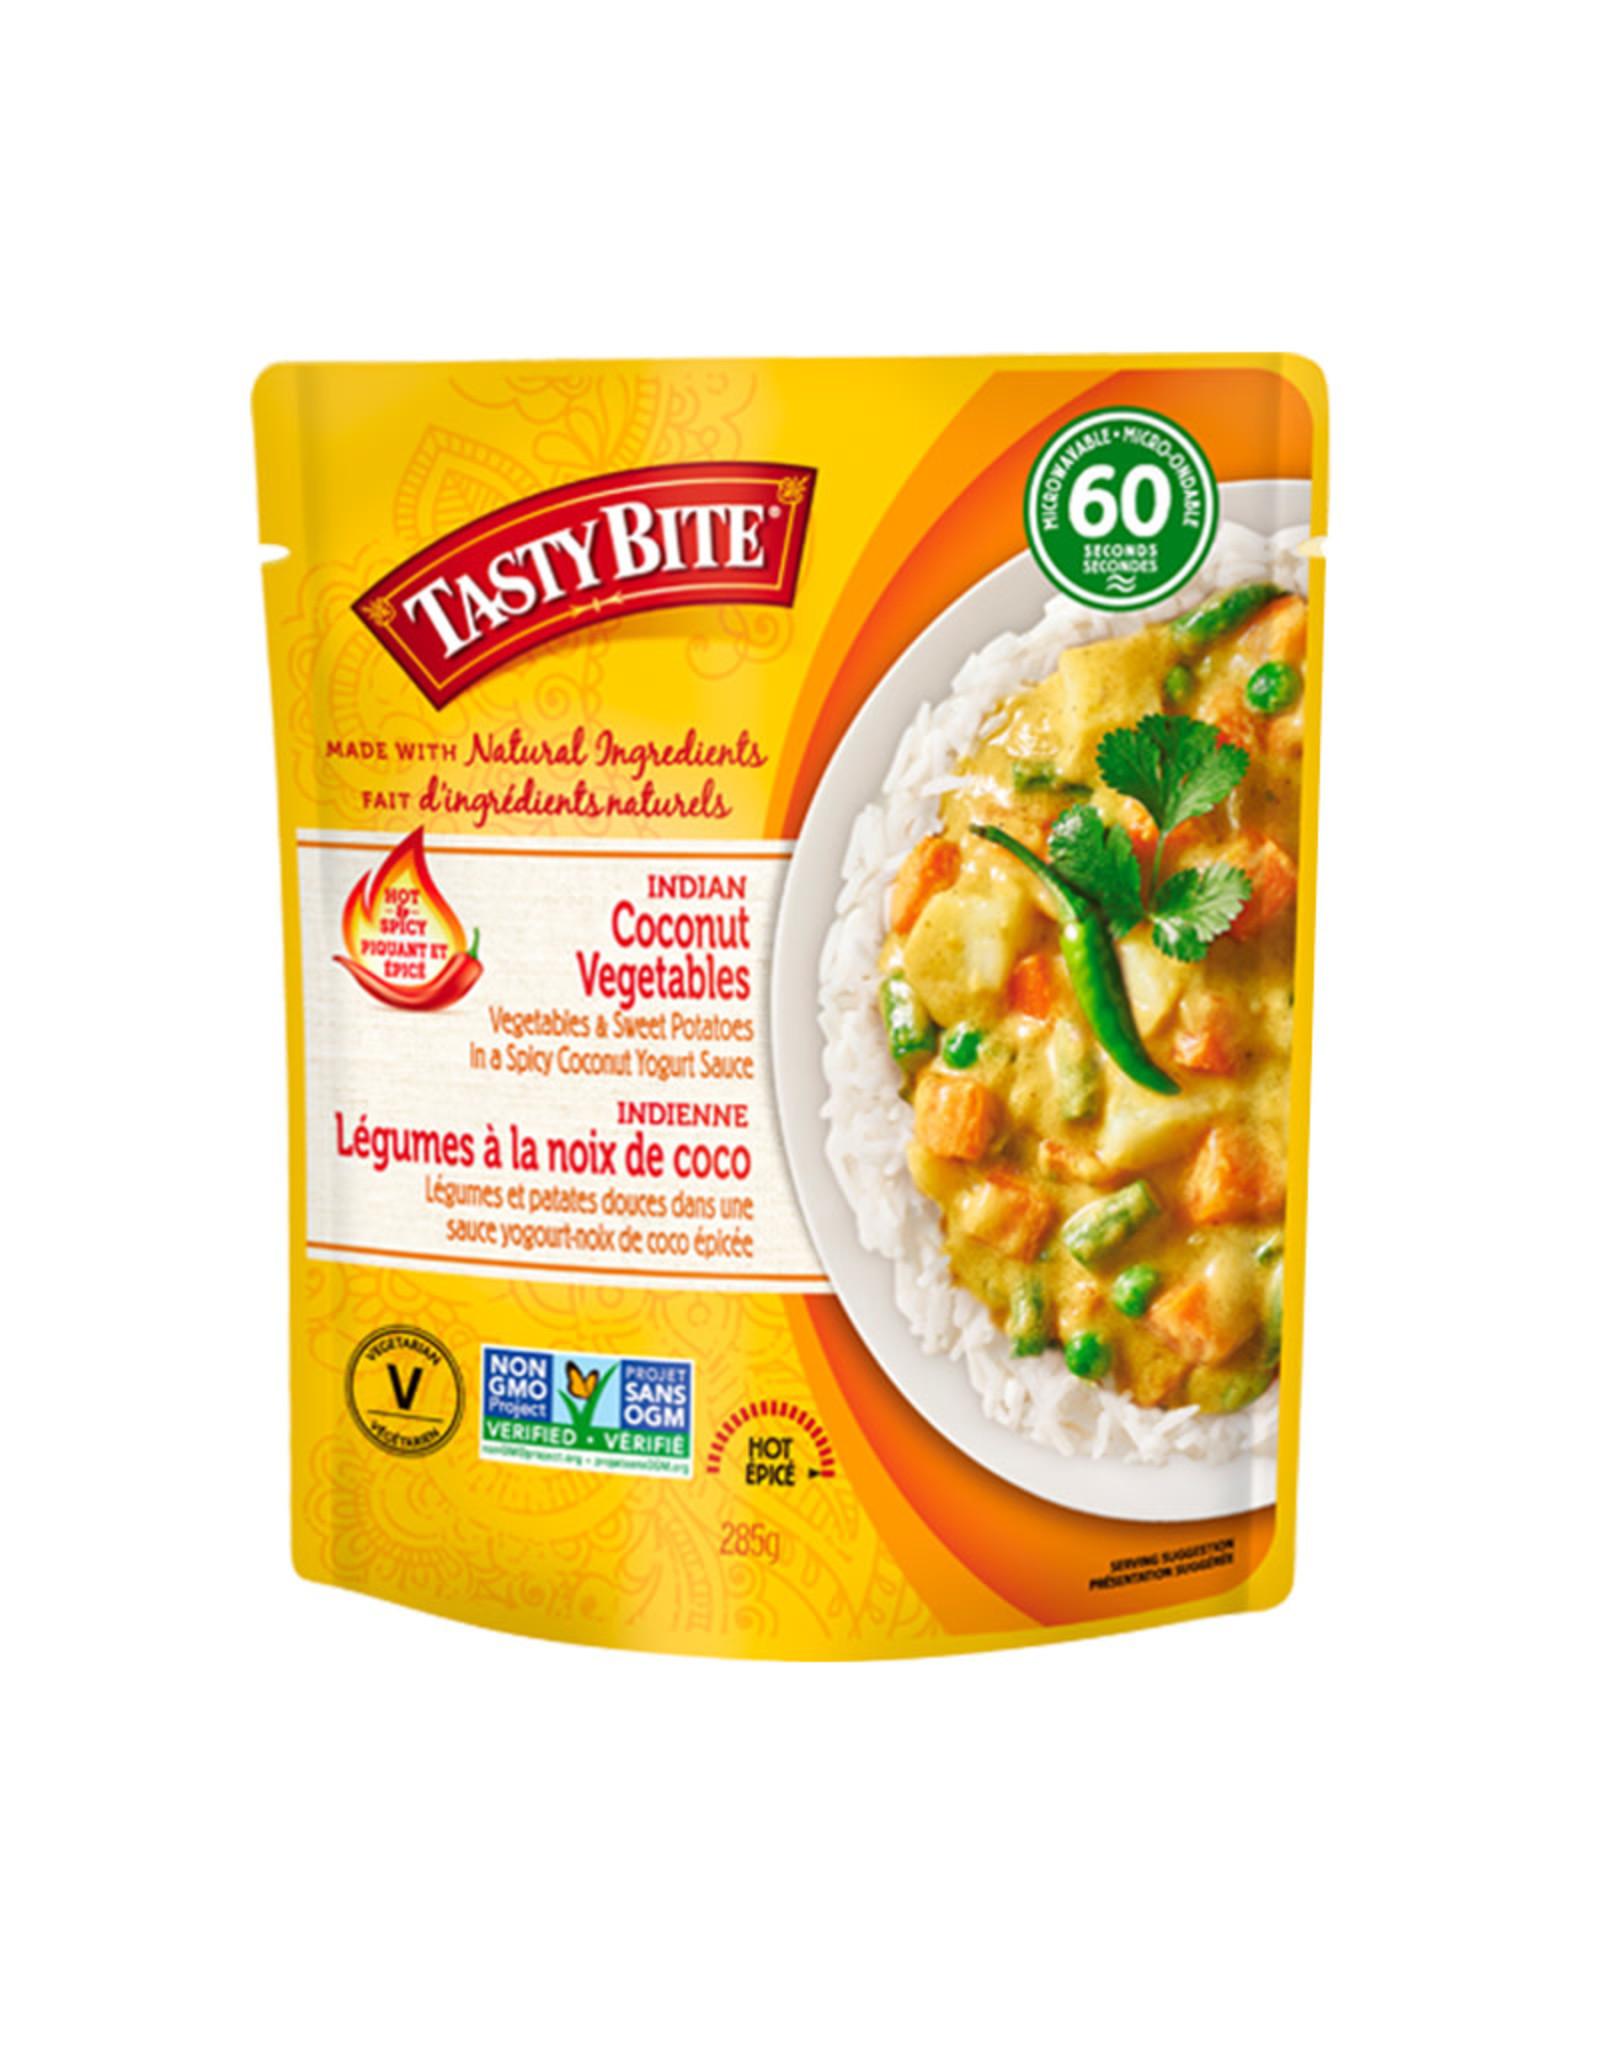 Tasty Bite Tasty Bite - Indian Coconut Vegetables Hot & Spicy (285g)